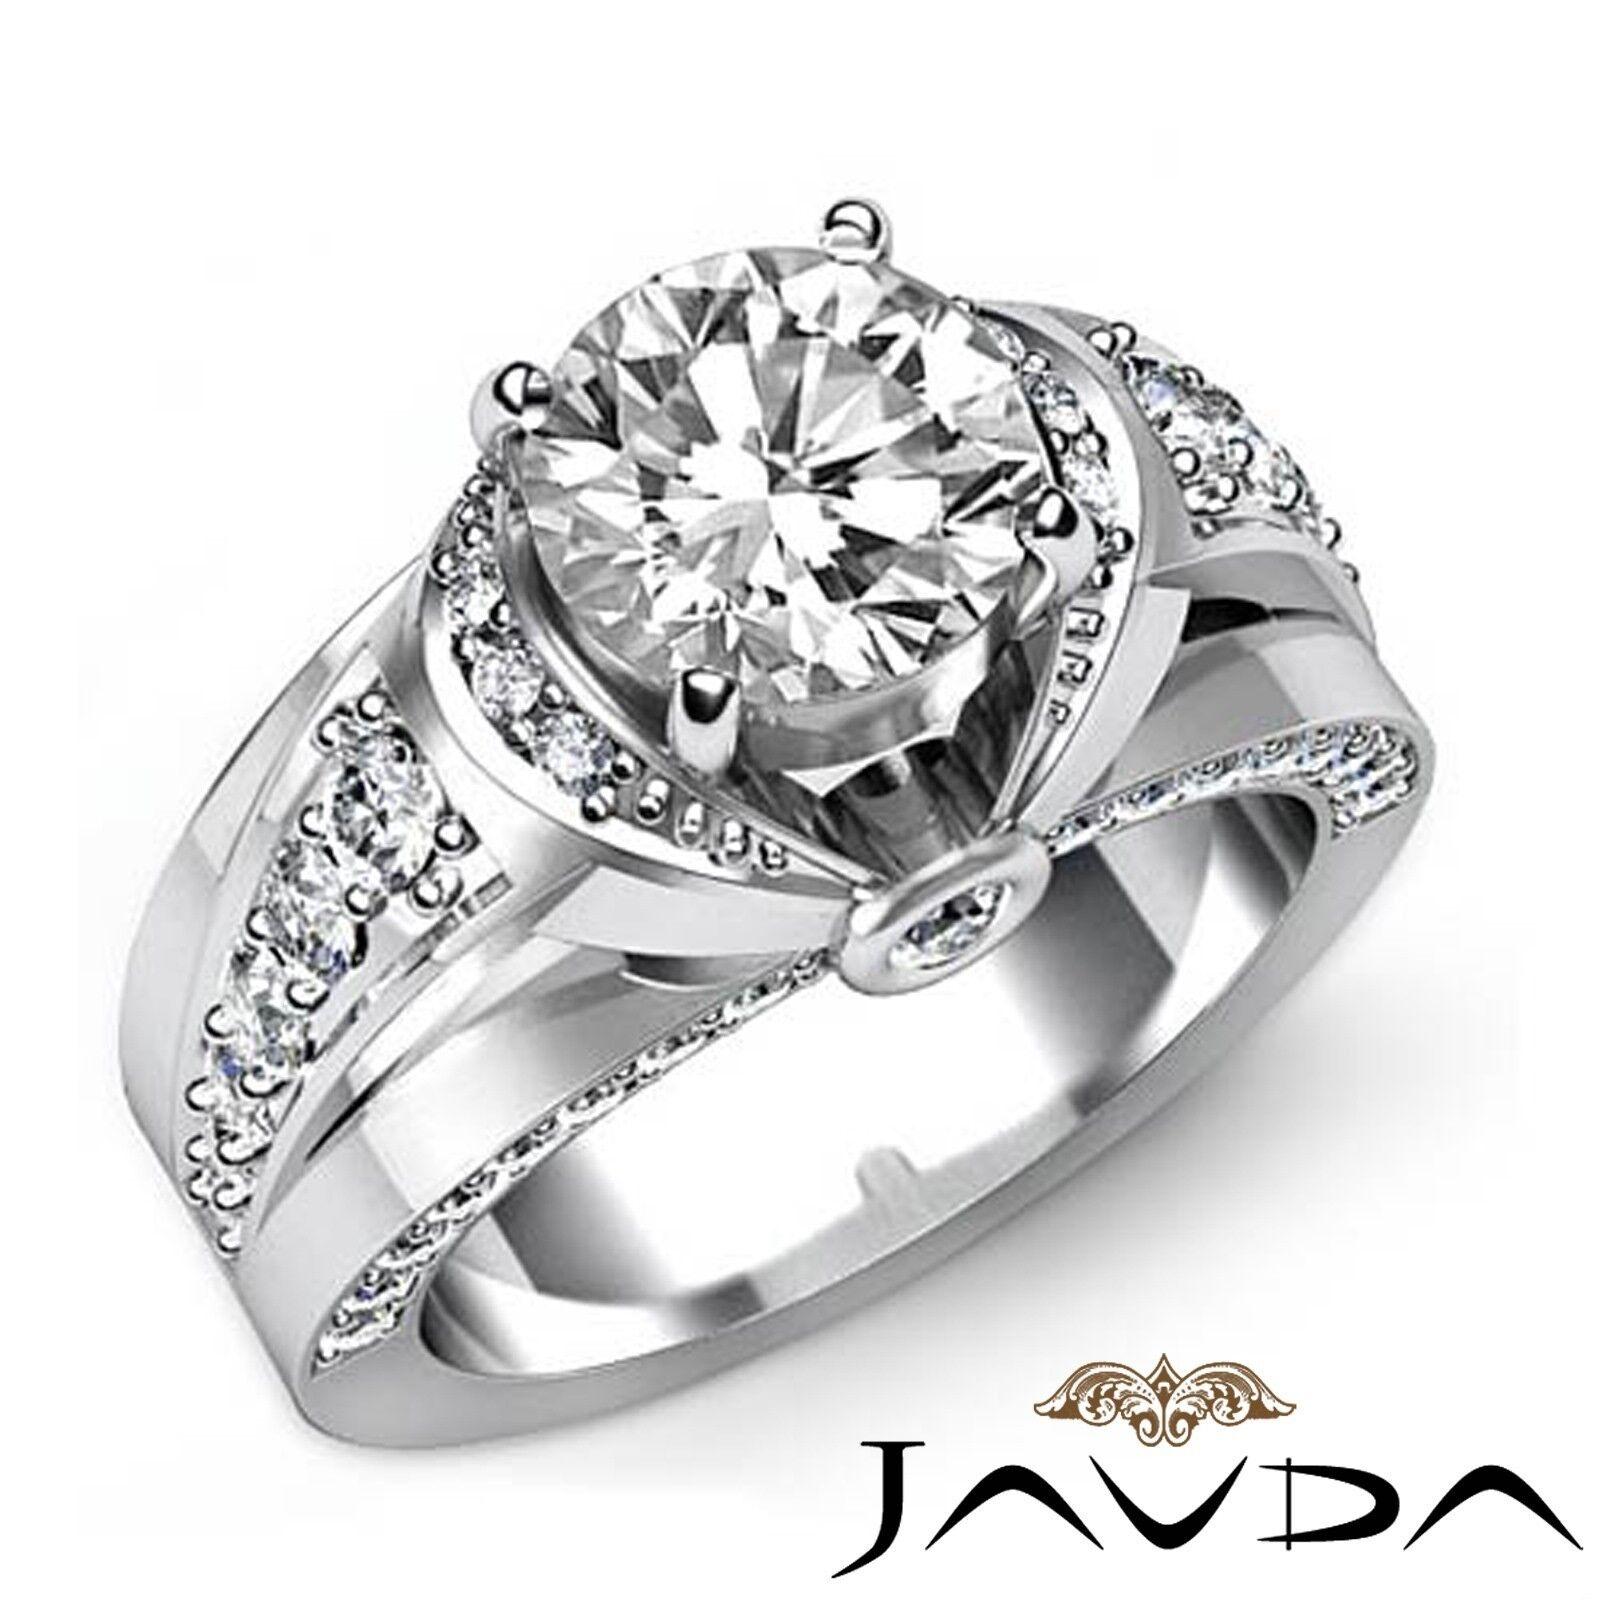 1.74ct Knot Classic Sidestone Round Diamond Engagement Ring GIA I-VS1 White Gold